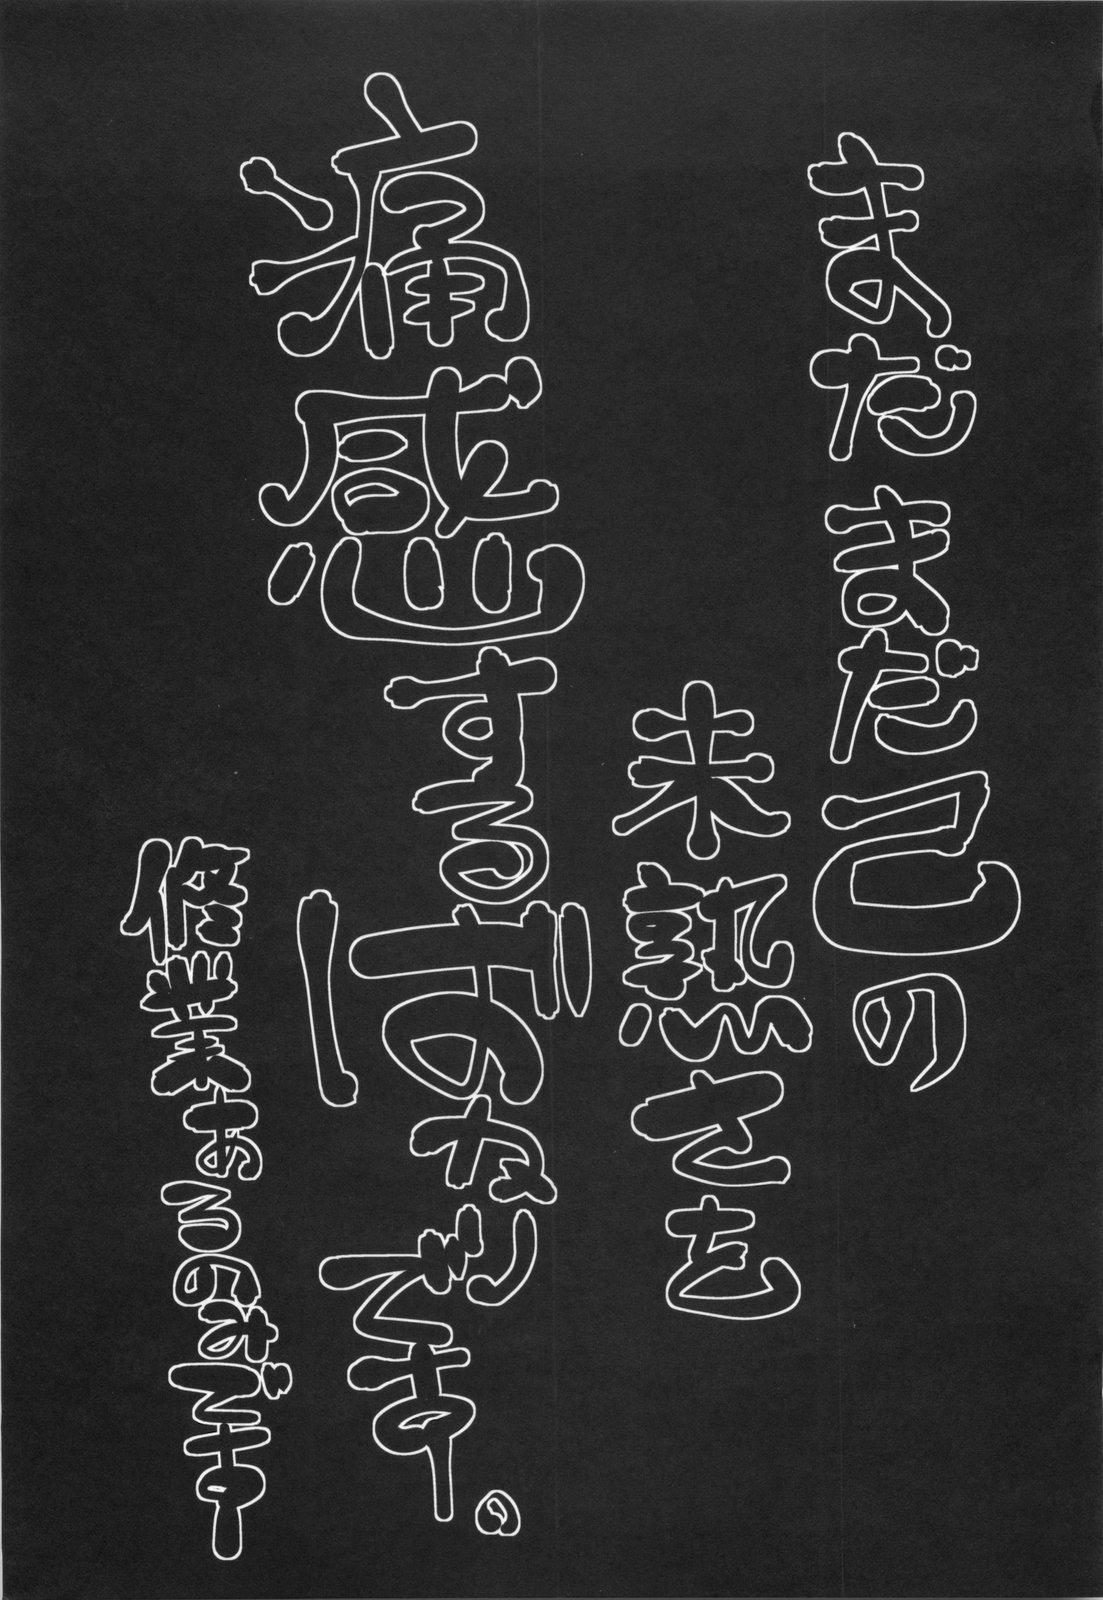 [Gyonikun] Gosyujin-sama Senyou!? Ami-sama Senyou 200